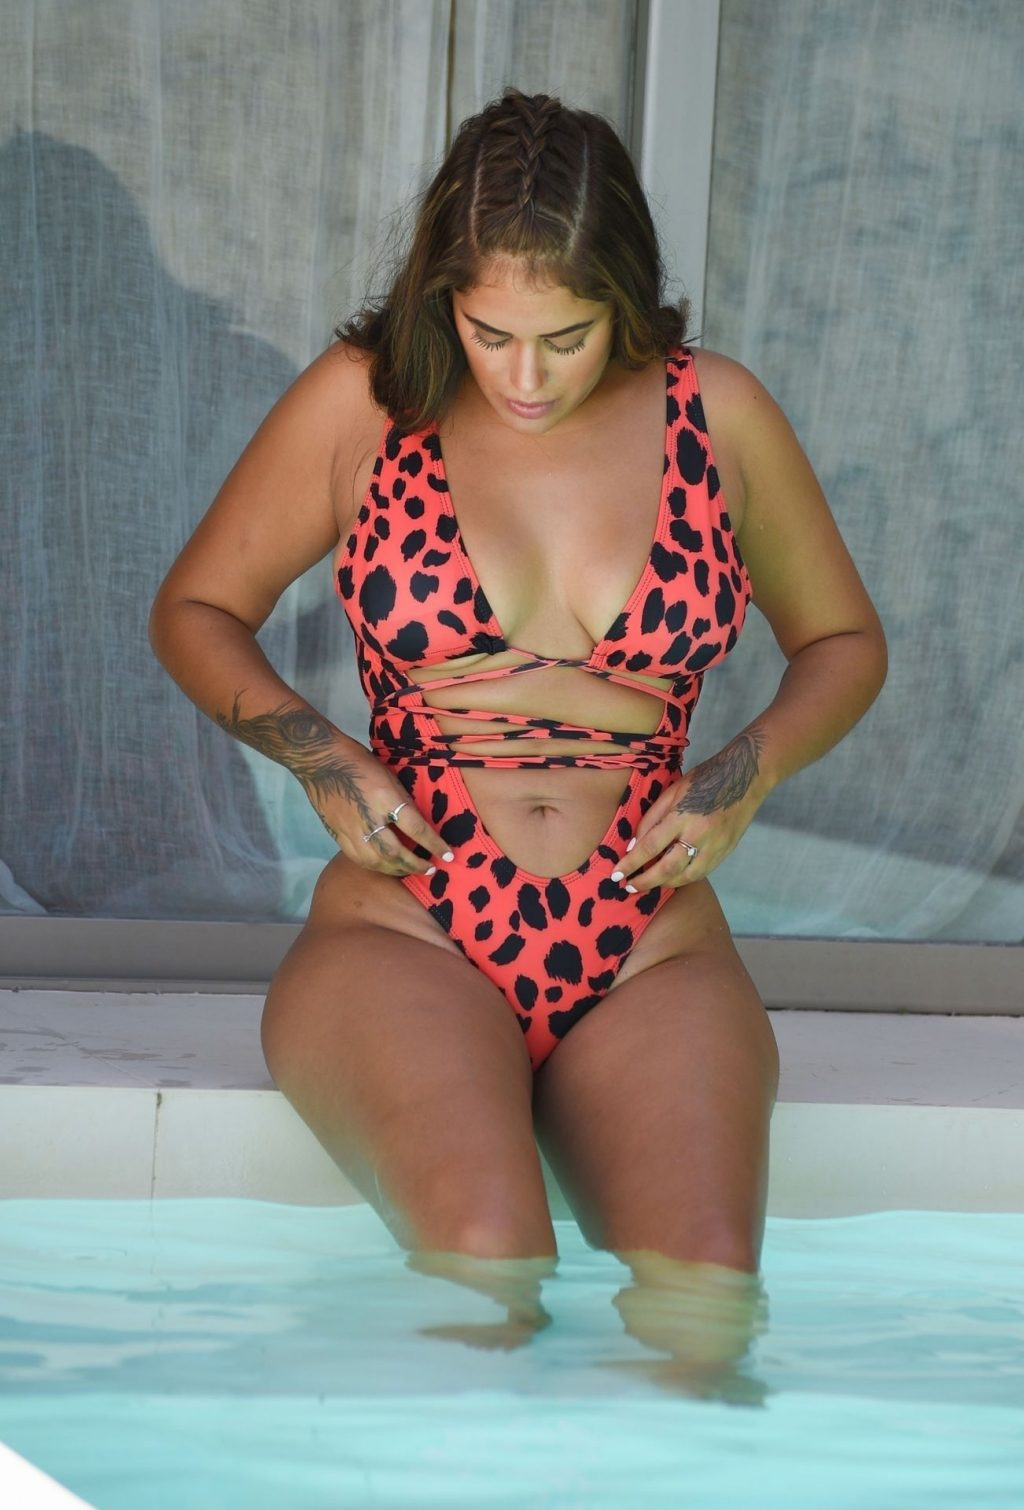 Malin Andersson 2019 : Malin Andersson – Bikini candids-21